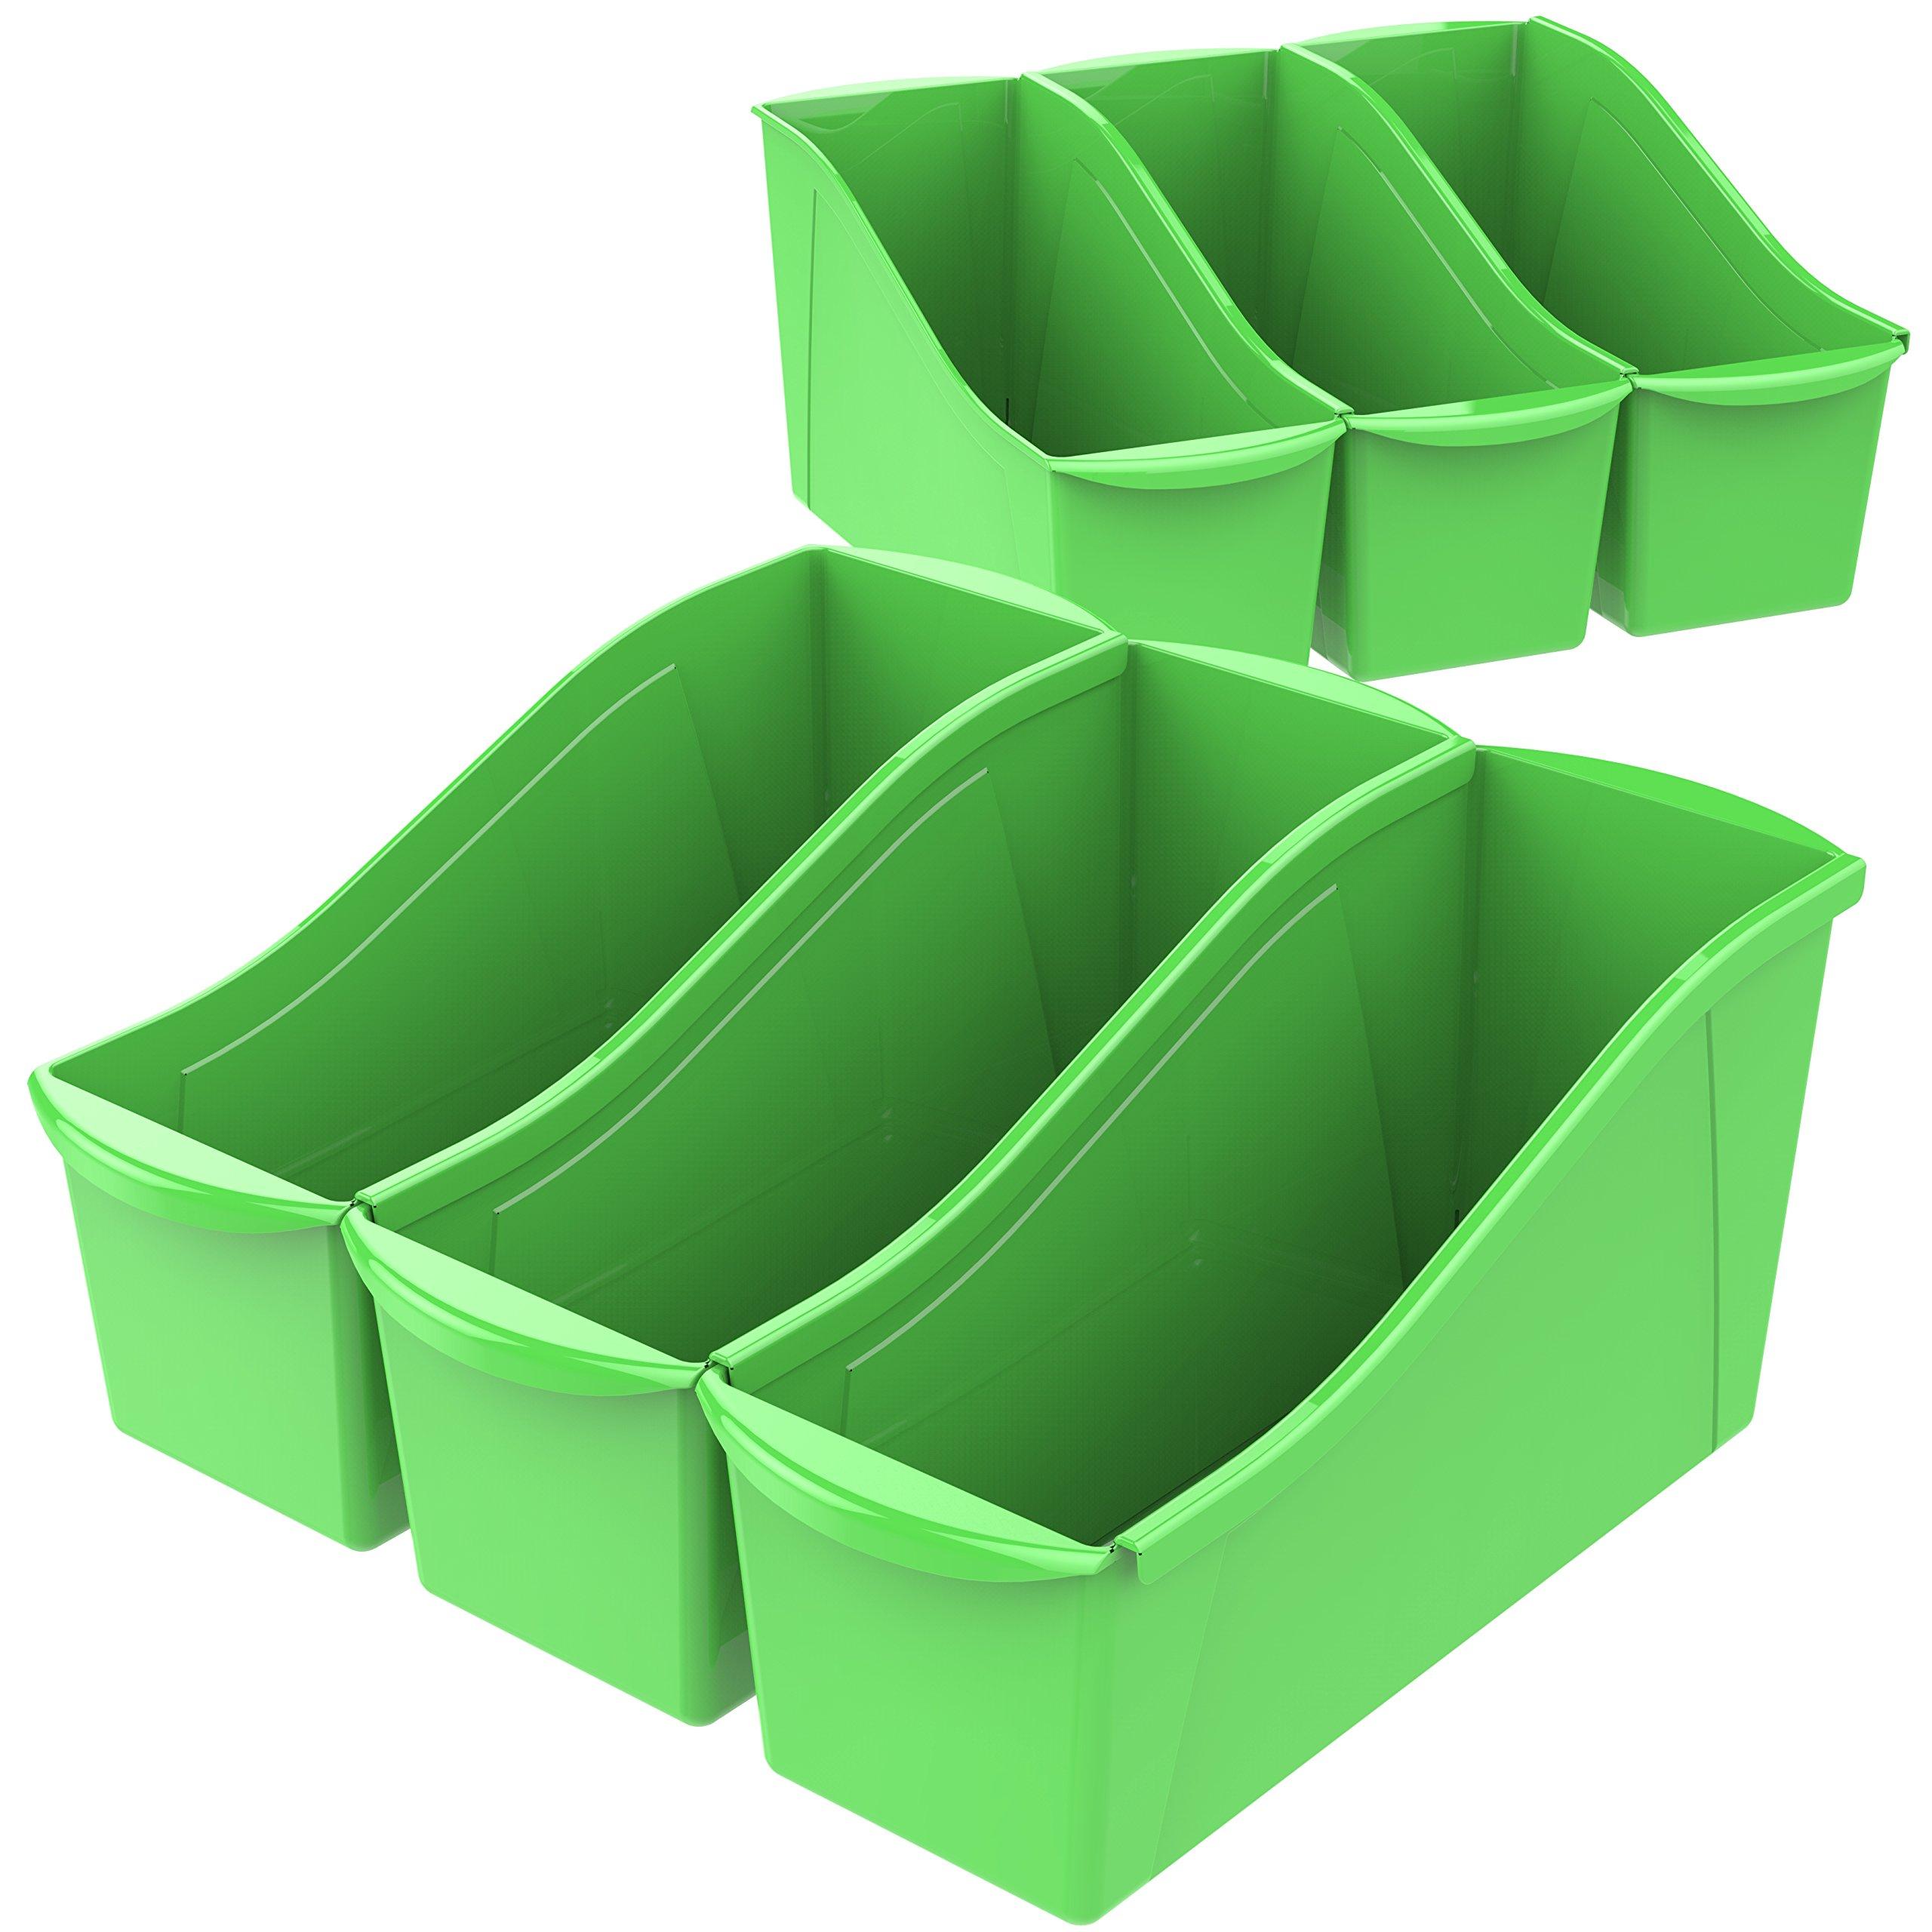 Storex Large Book Bin, 14.3 x 5.3 x 7 Inches, Green, Case of 6 (71118U06C) by Storex